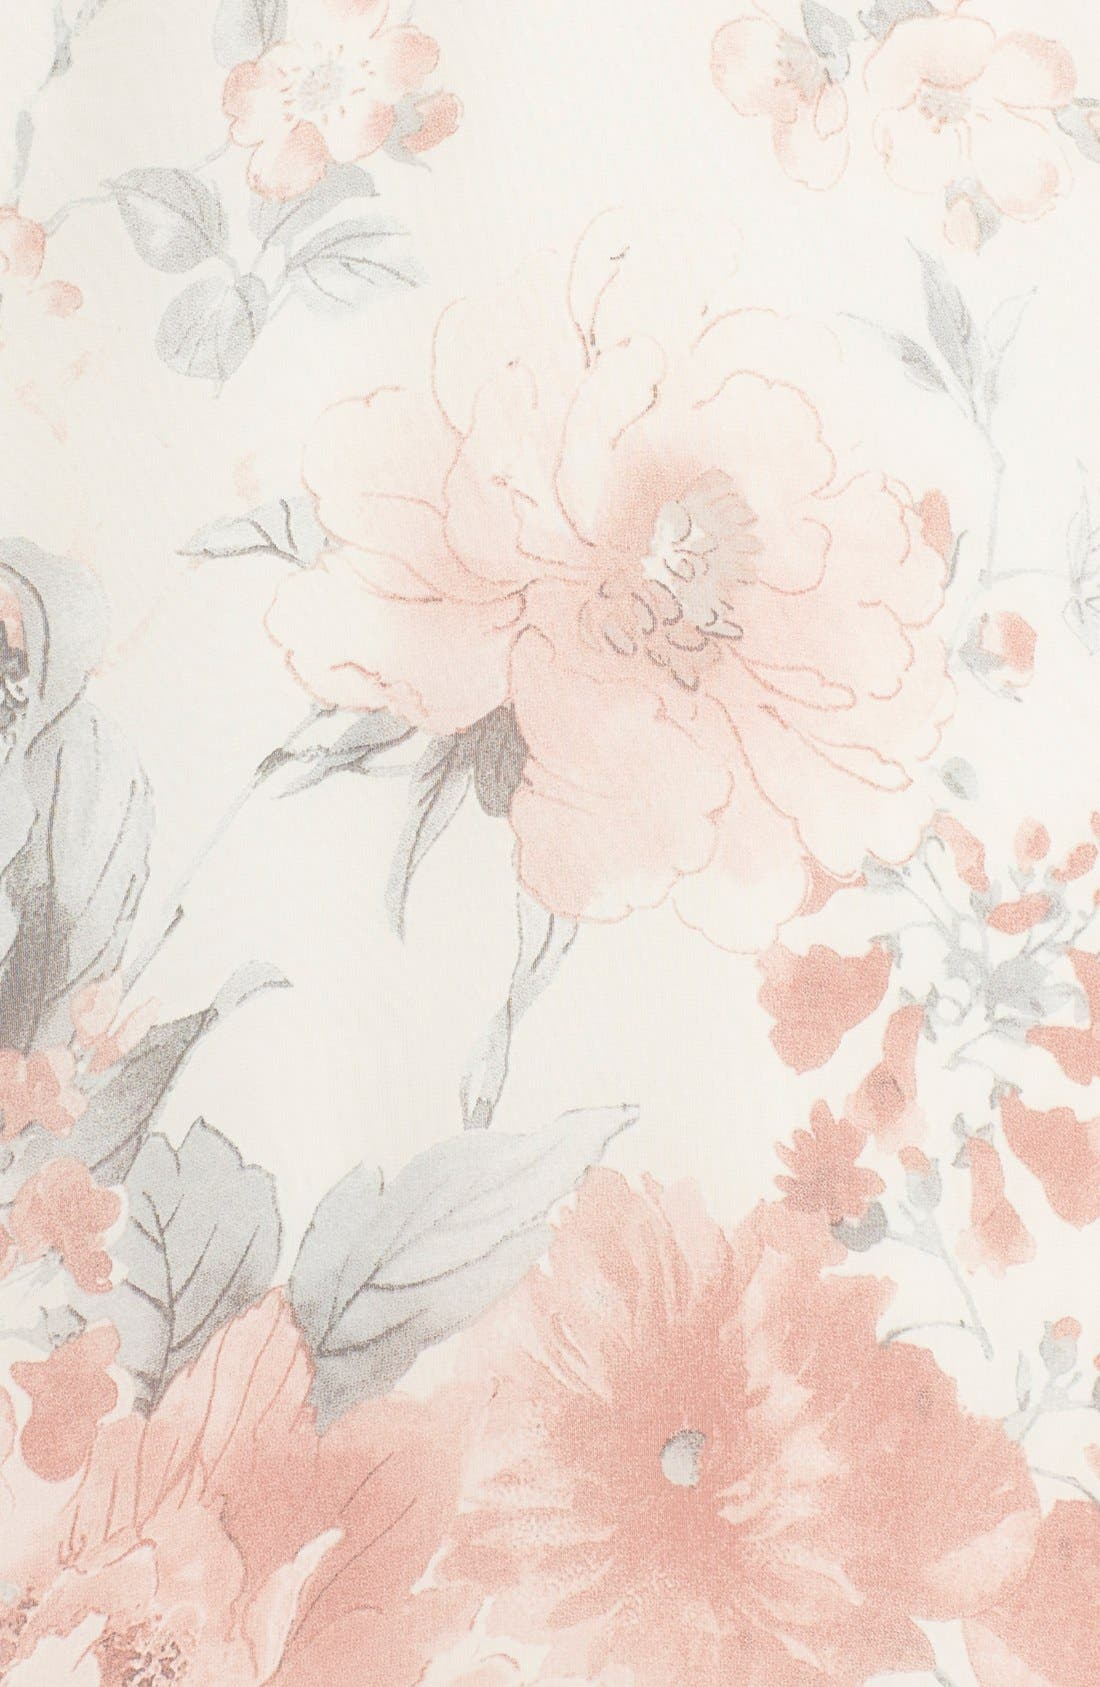 Floral Print Chiffon Blouson Dress,                             Alternate thumbnail 5, color,                             270